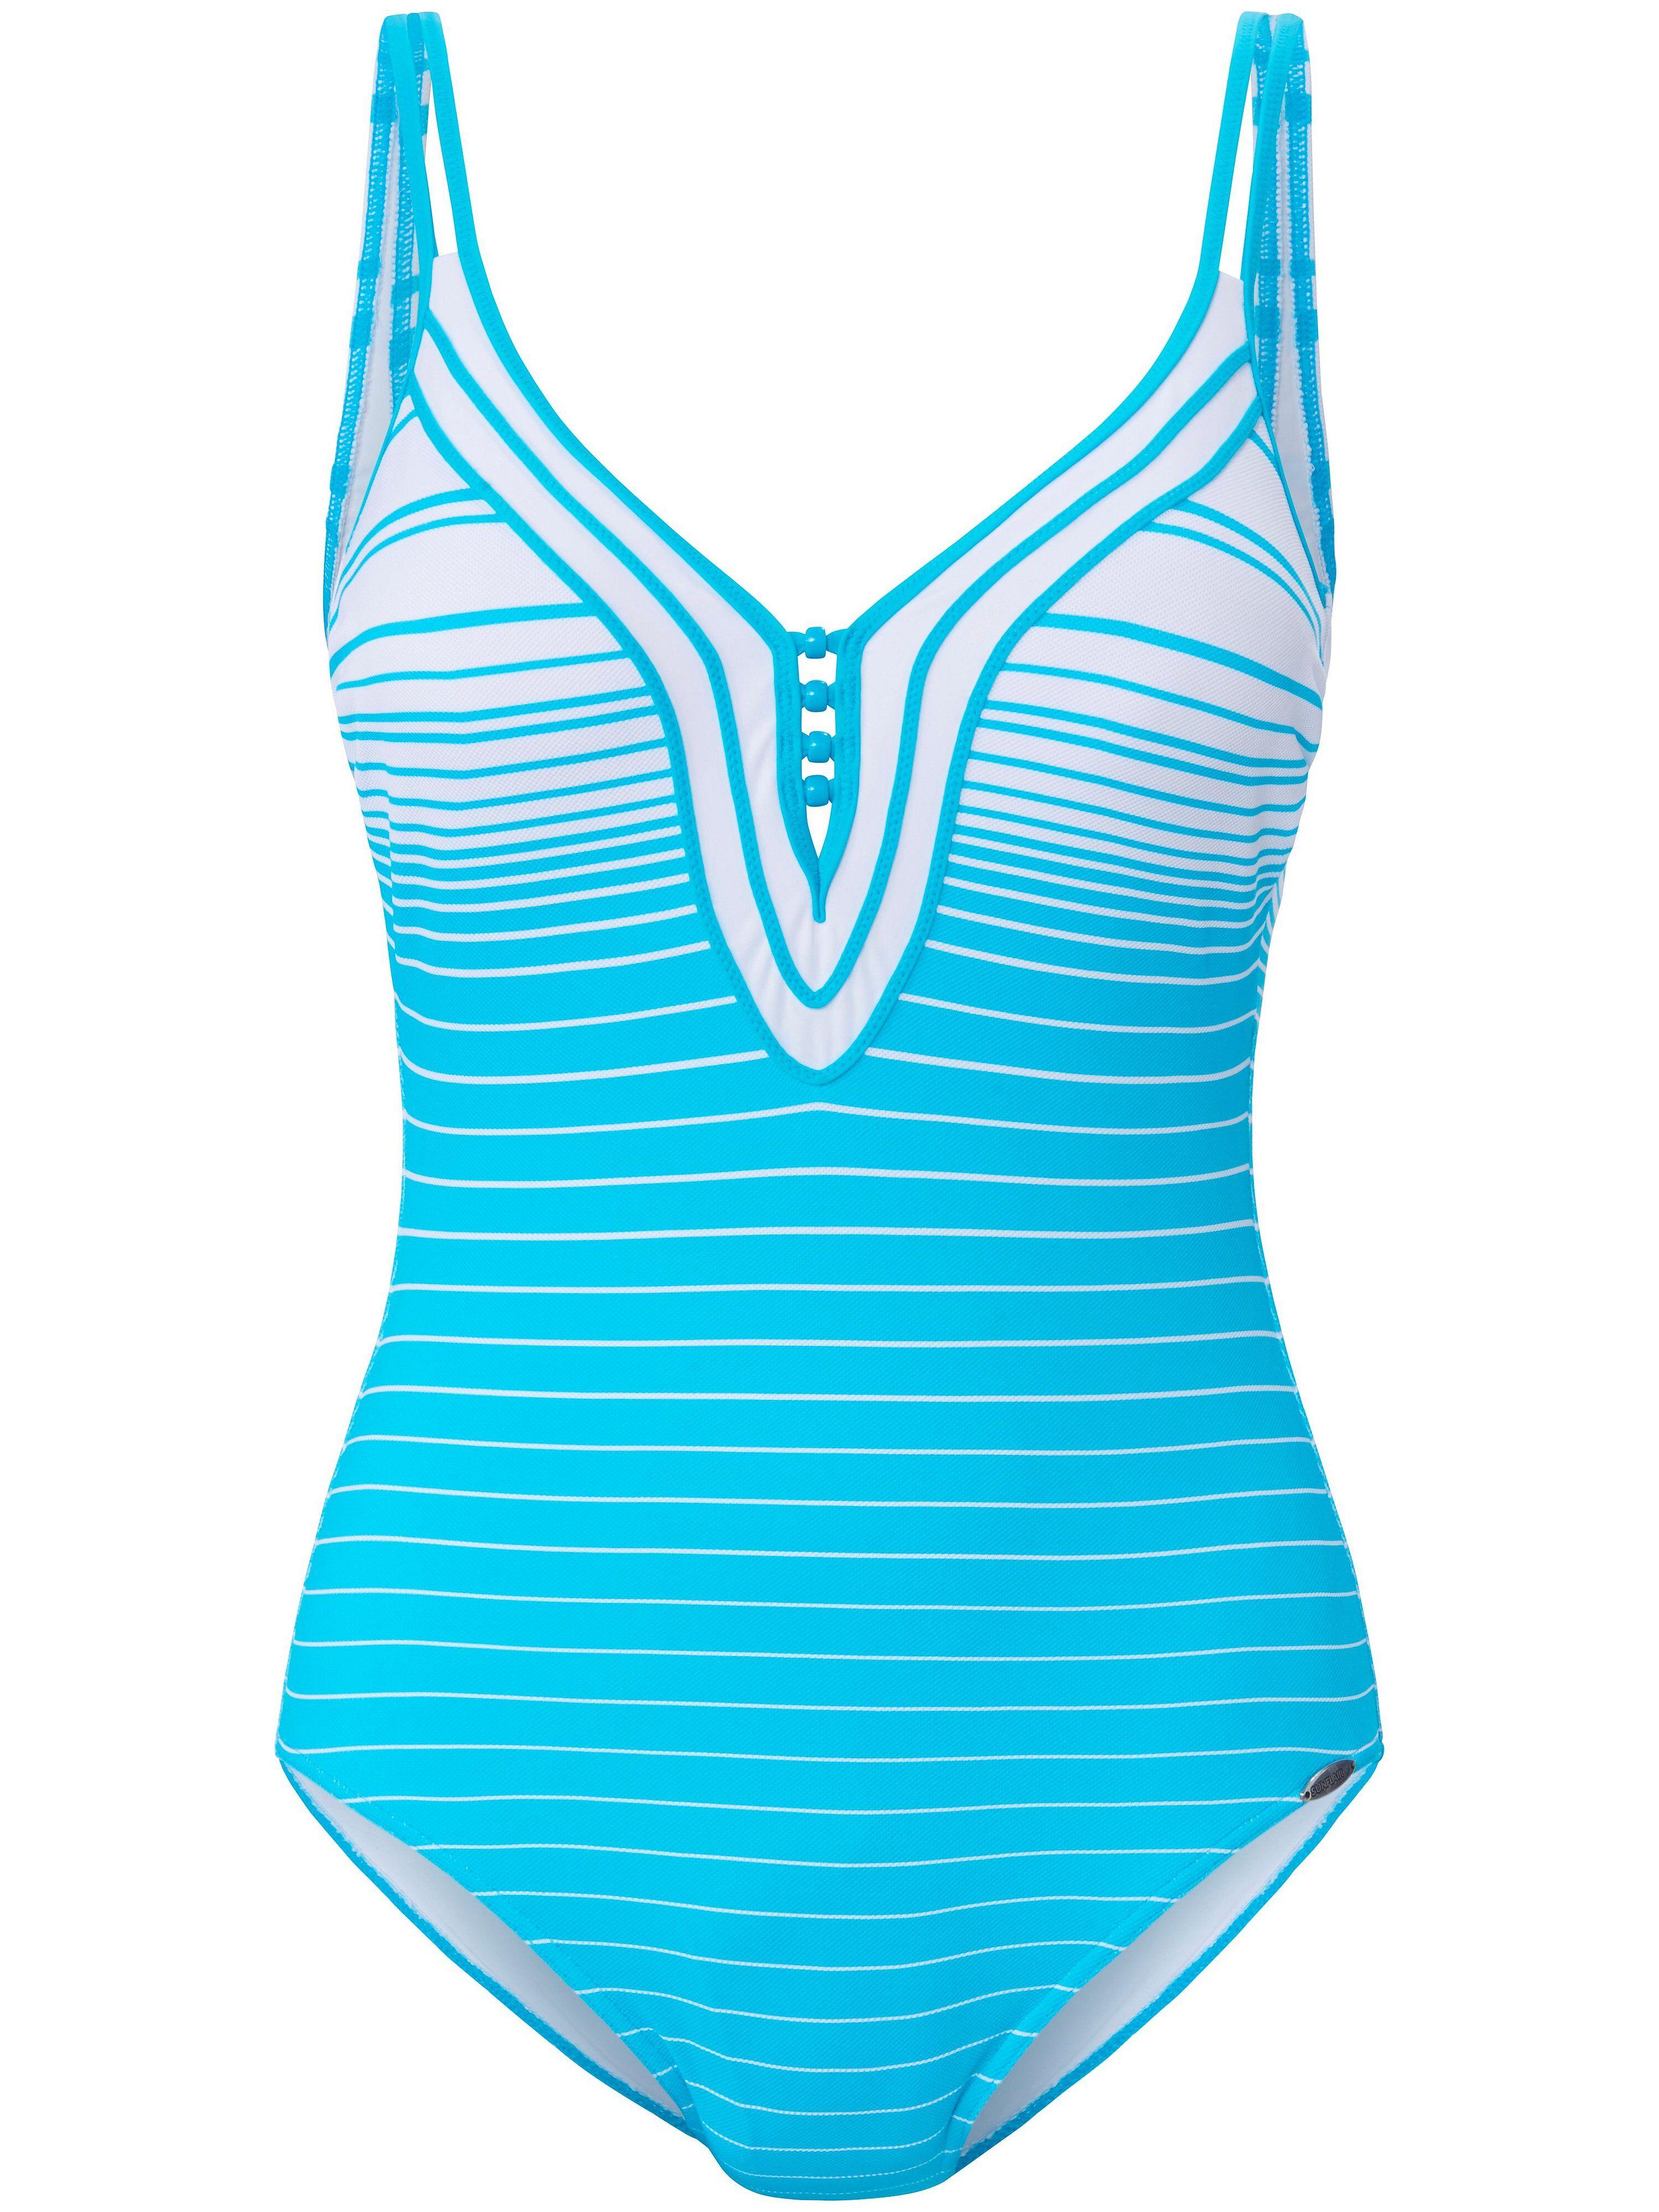 Sunflair Le maillot bain en microfibre  Sunflair turquoise  - Femme - 42